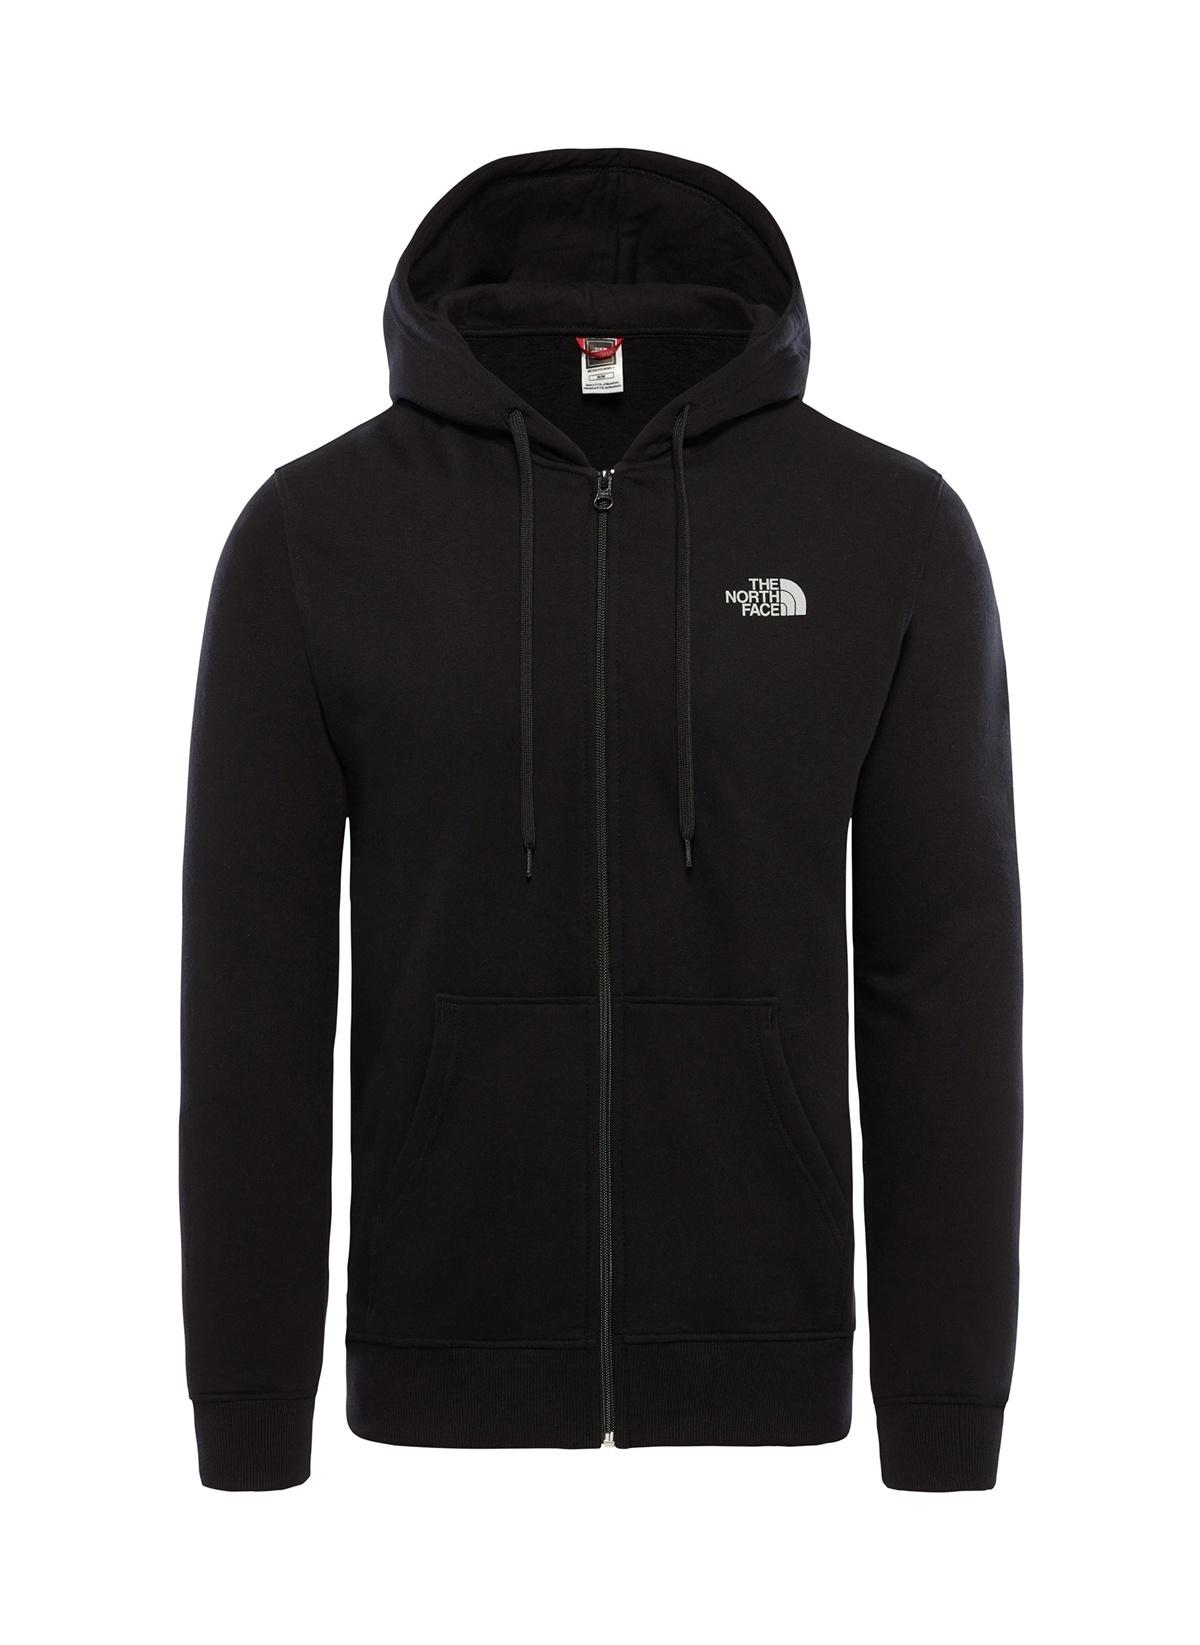 The North Face Sweatshirt 519.0 Tl